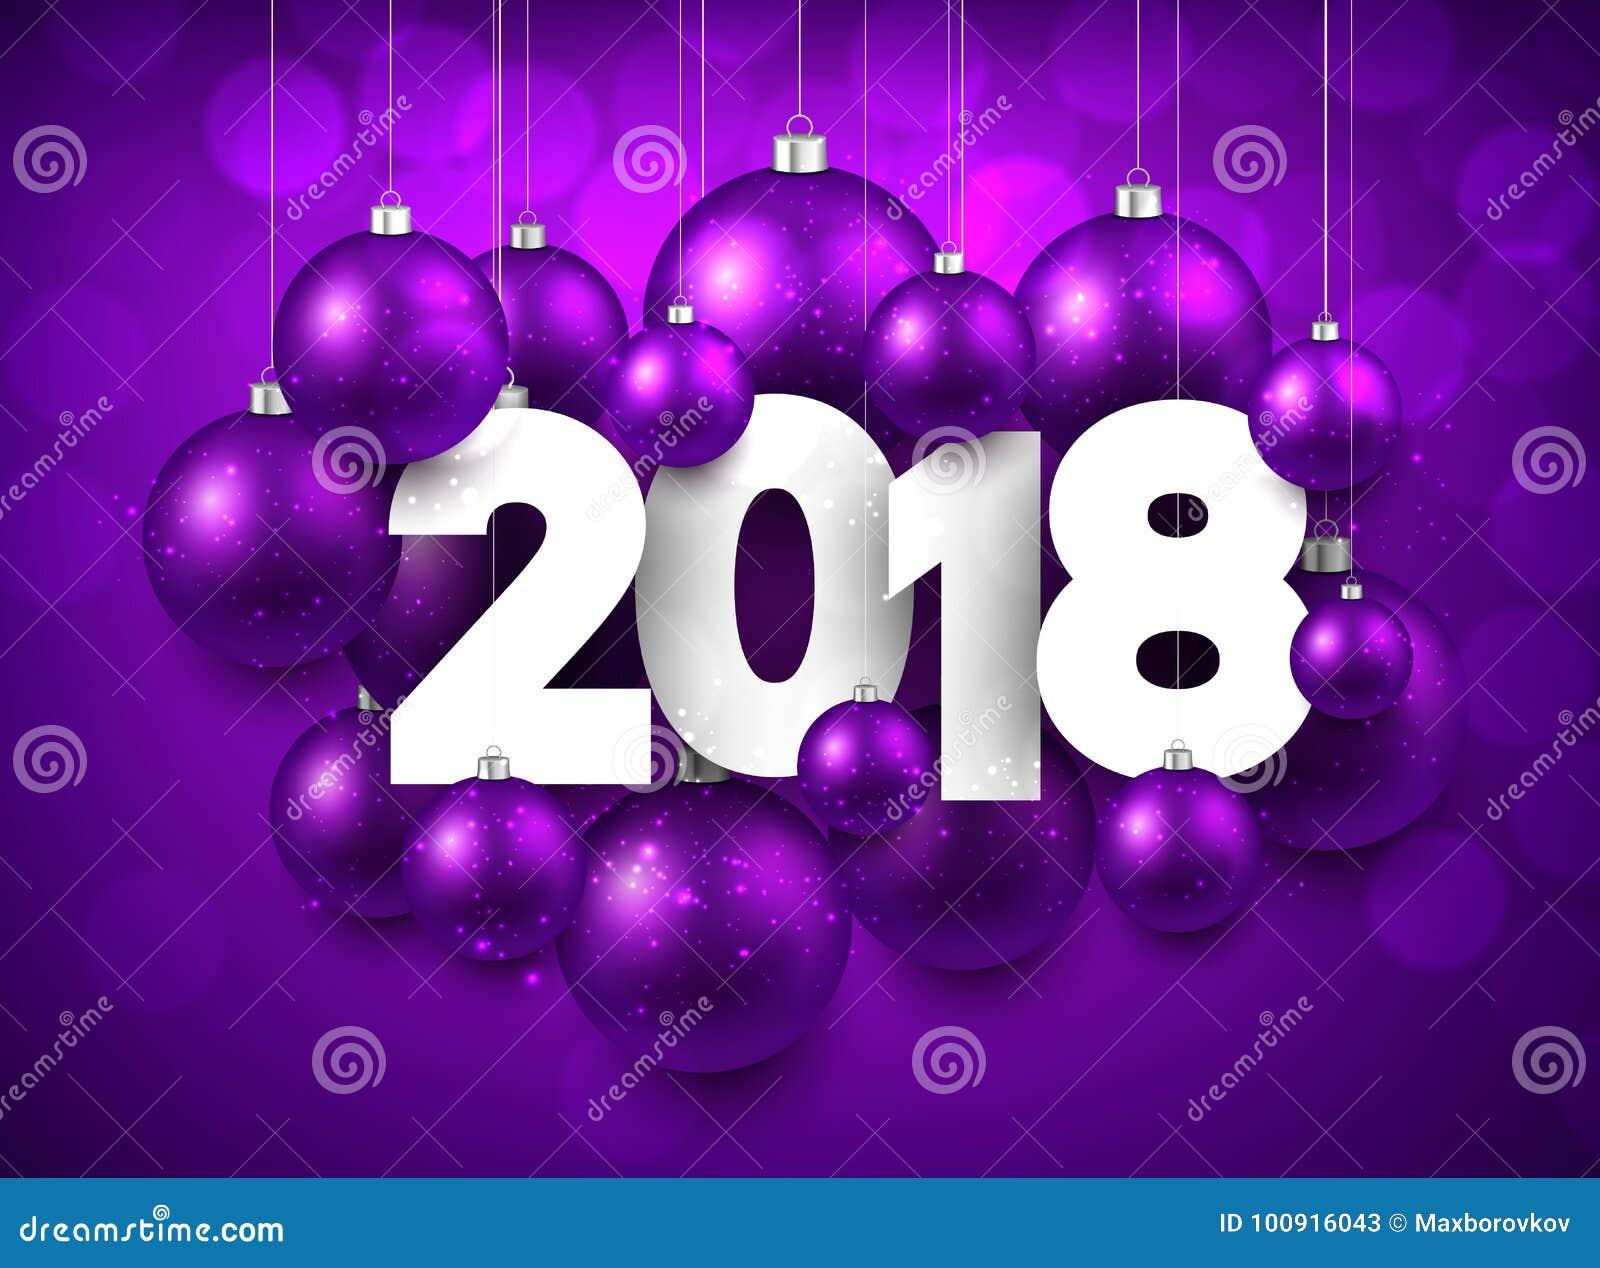 purple 2018 new year background